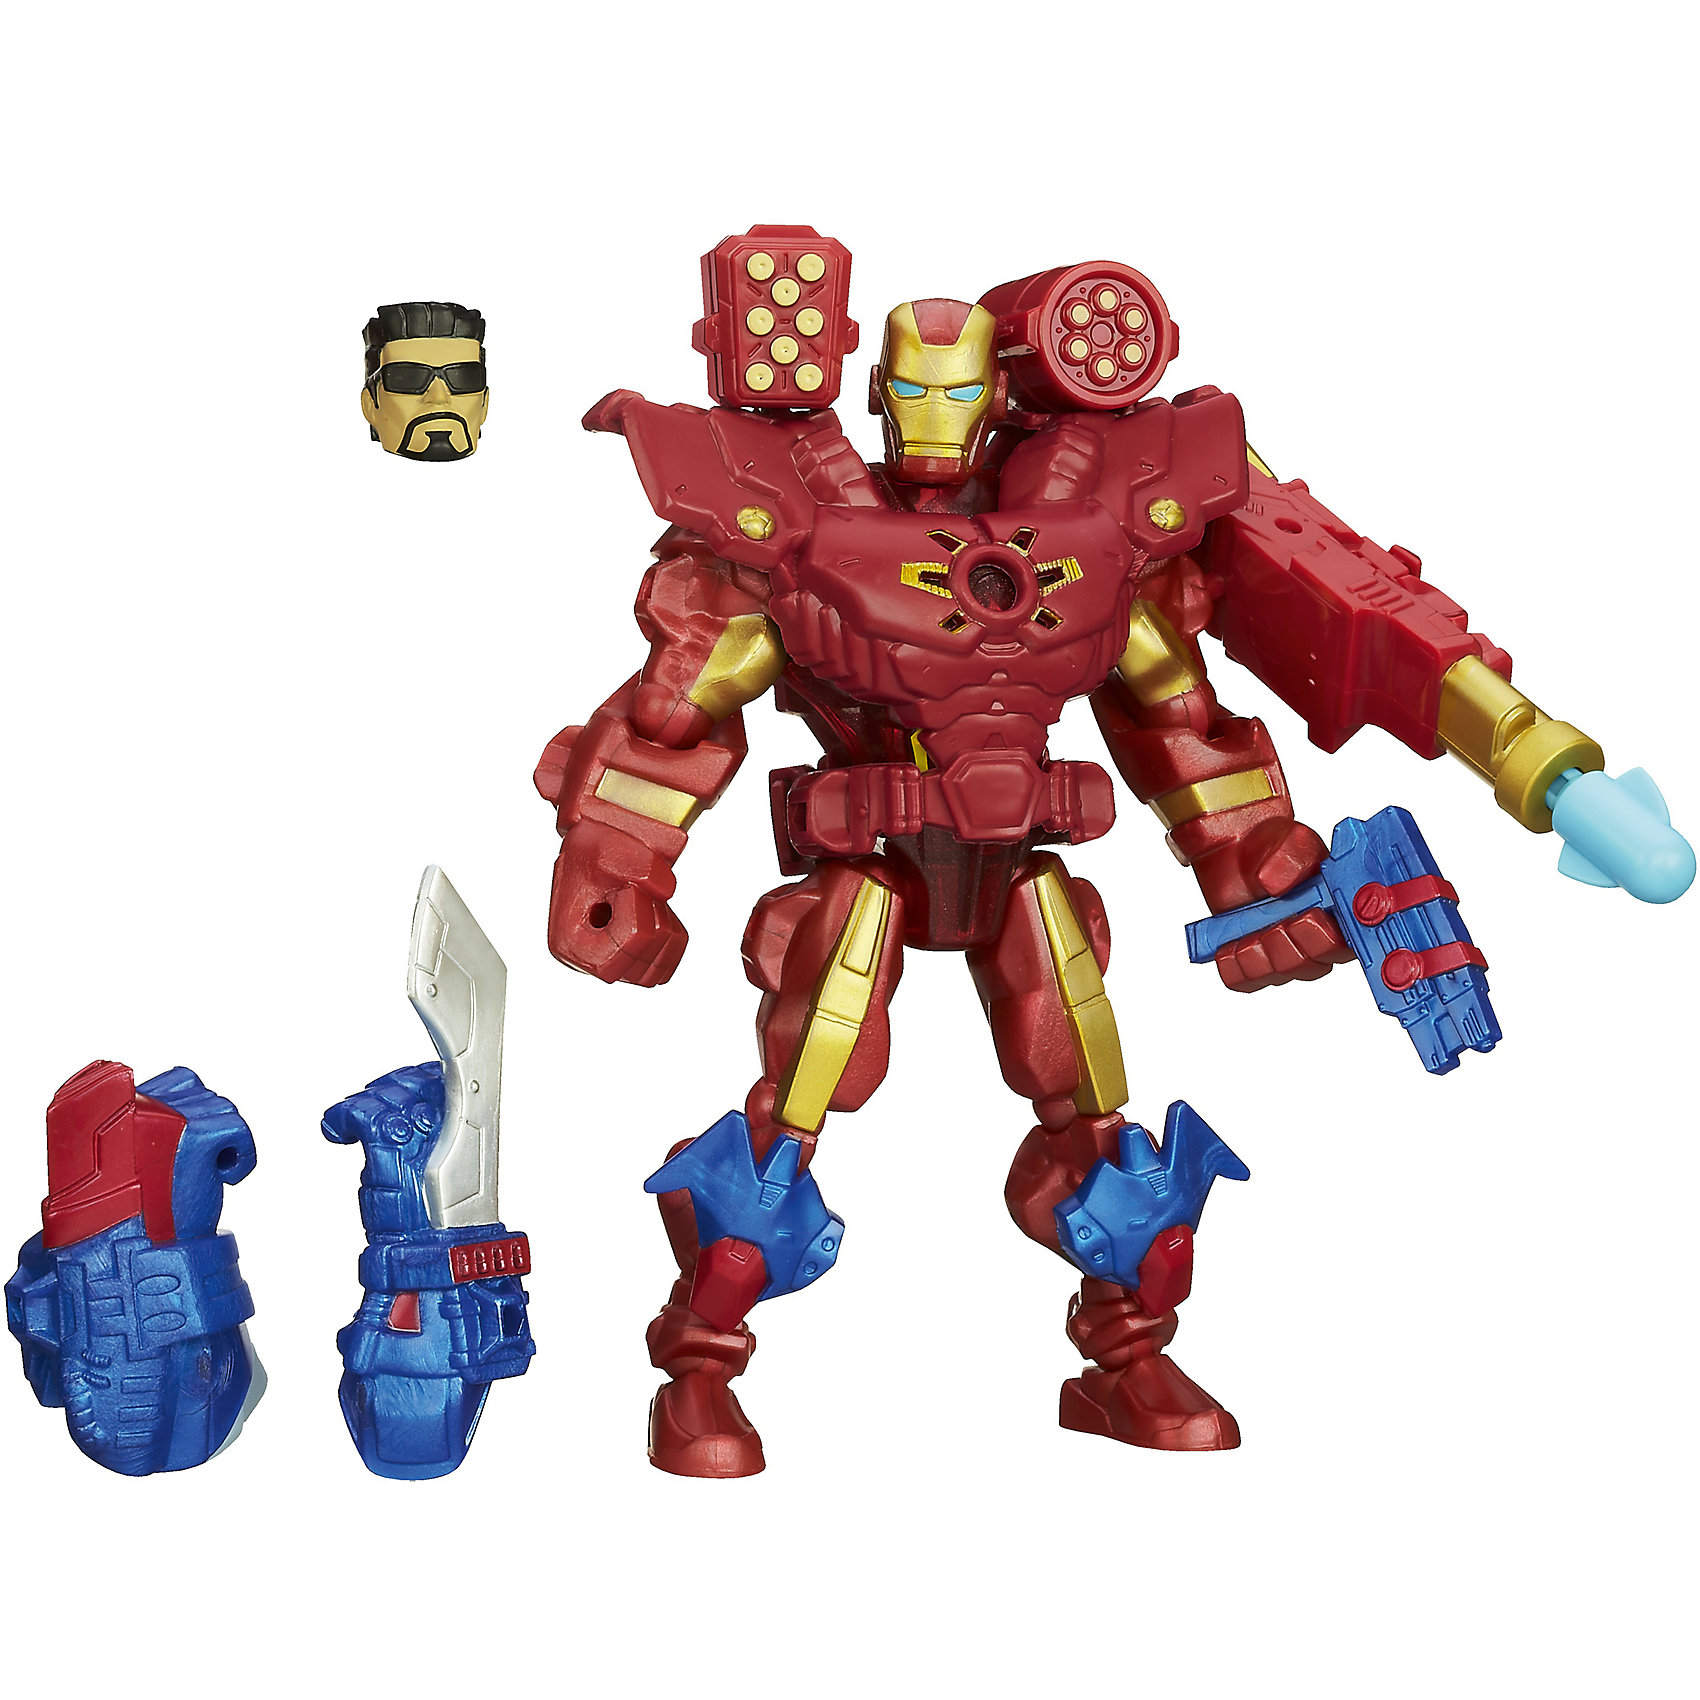 Hasbro Электронная разборная фигурка, Железный человек, Marvel Heroes marvel маска карнавальная детская железный человек